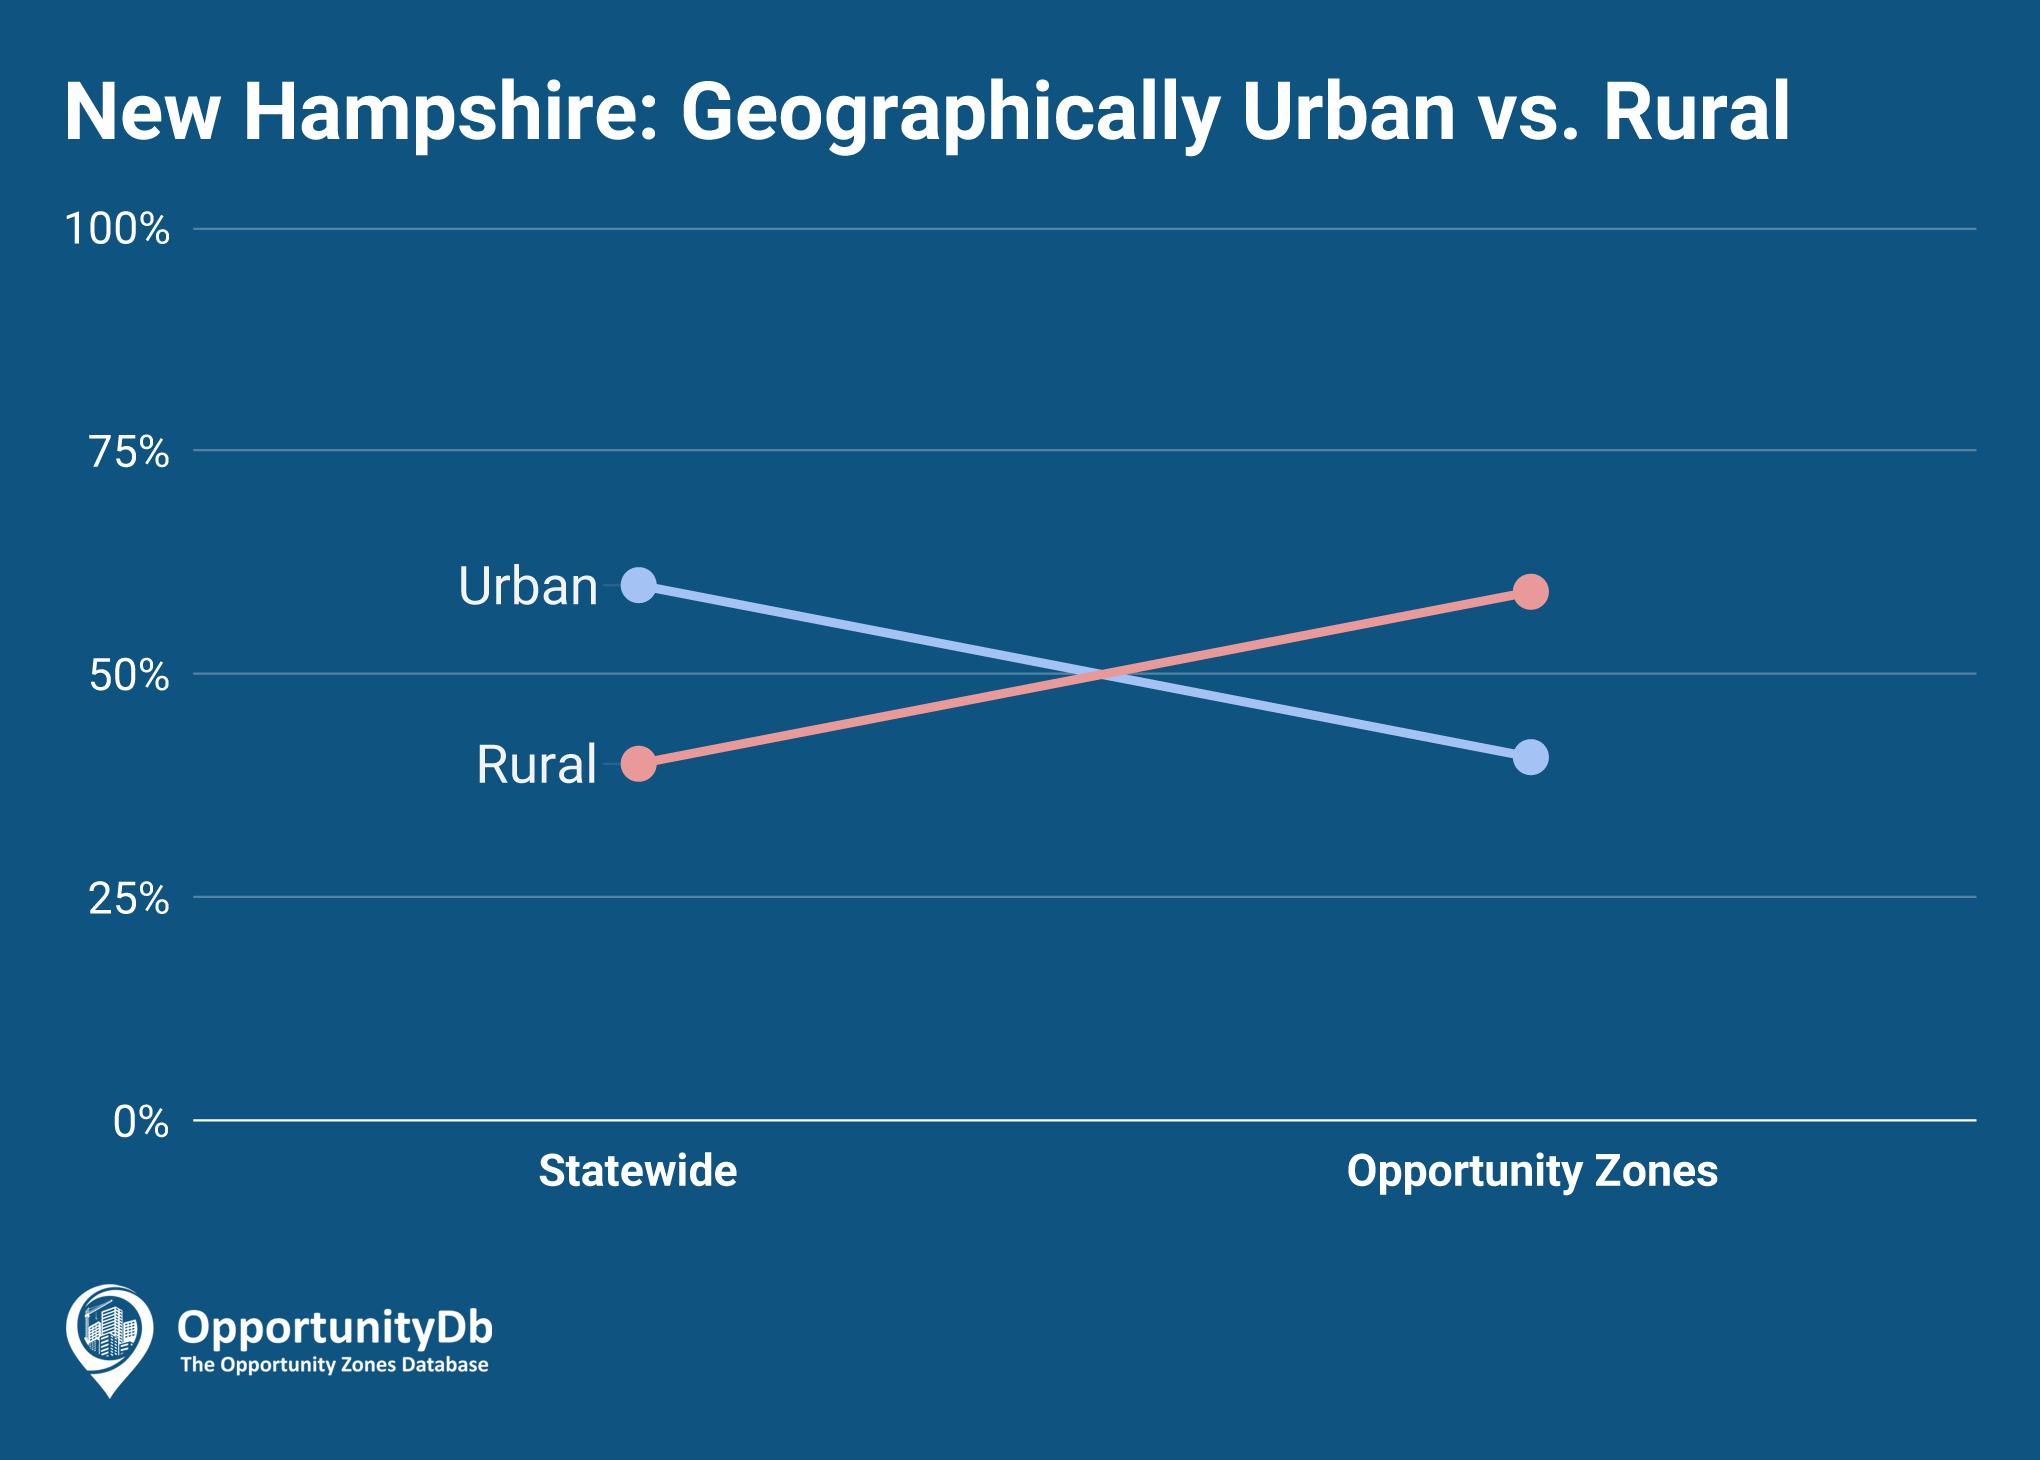 Urban vs. Rural in New Hampshire Opportunity Zones